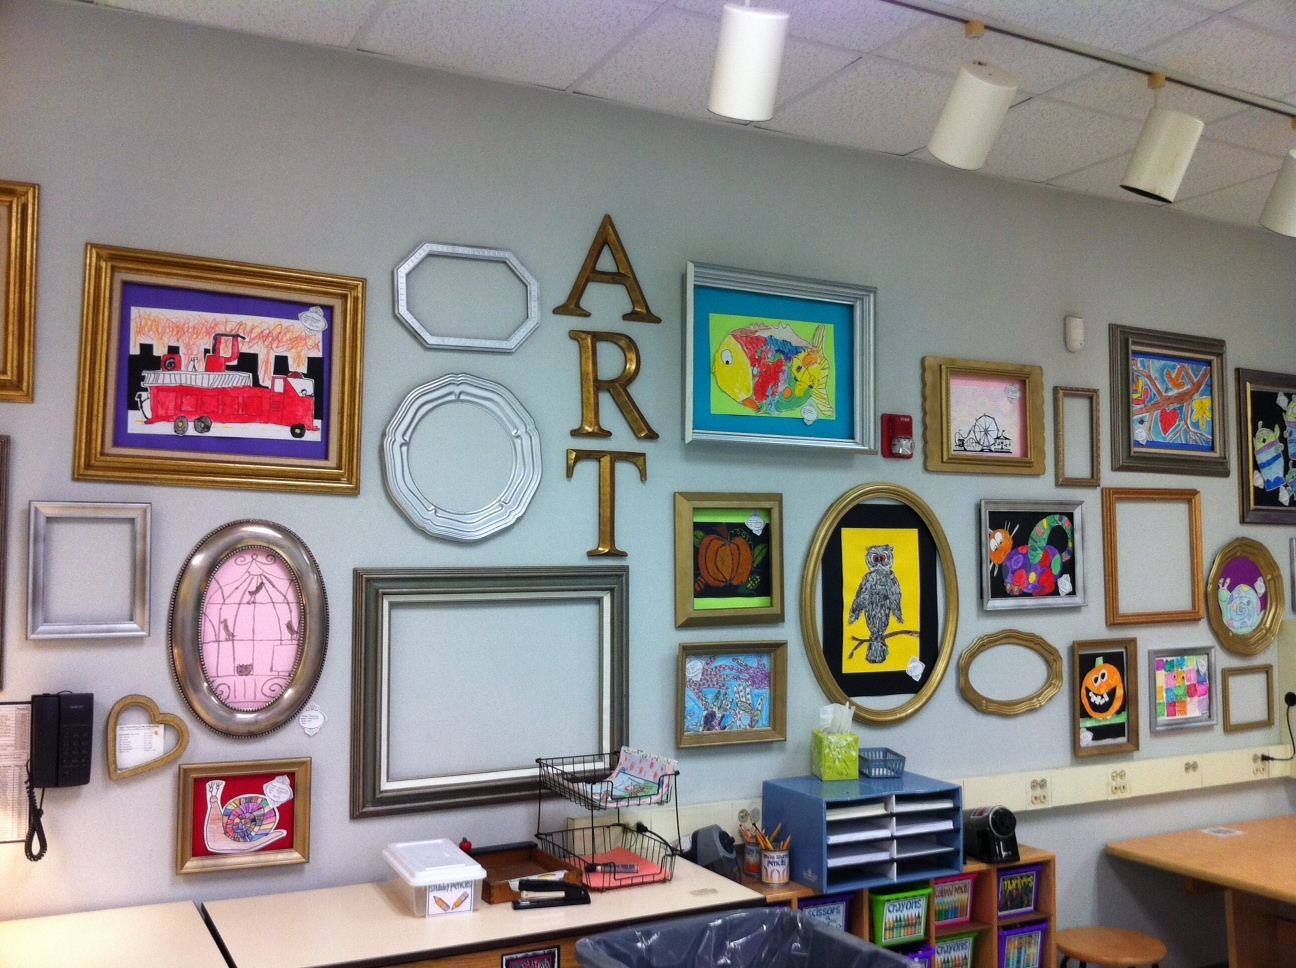 Art Classroom Wall Decor : Apex elementary art wall of frames for student artwork